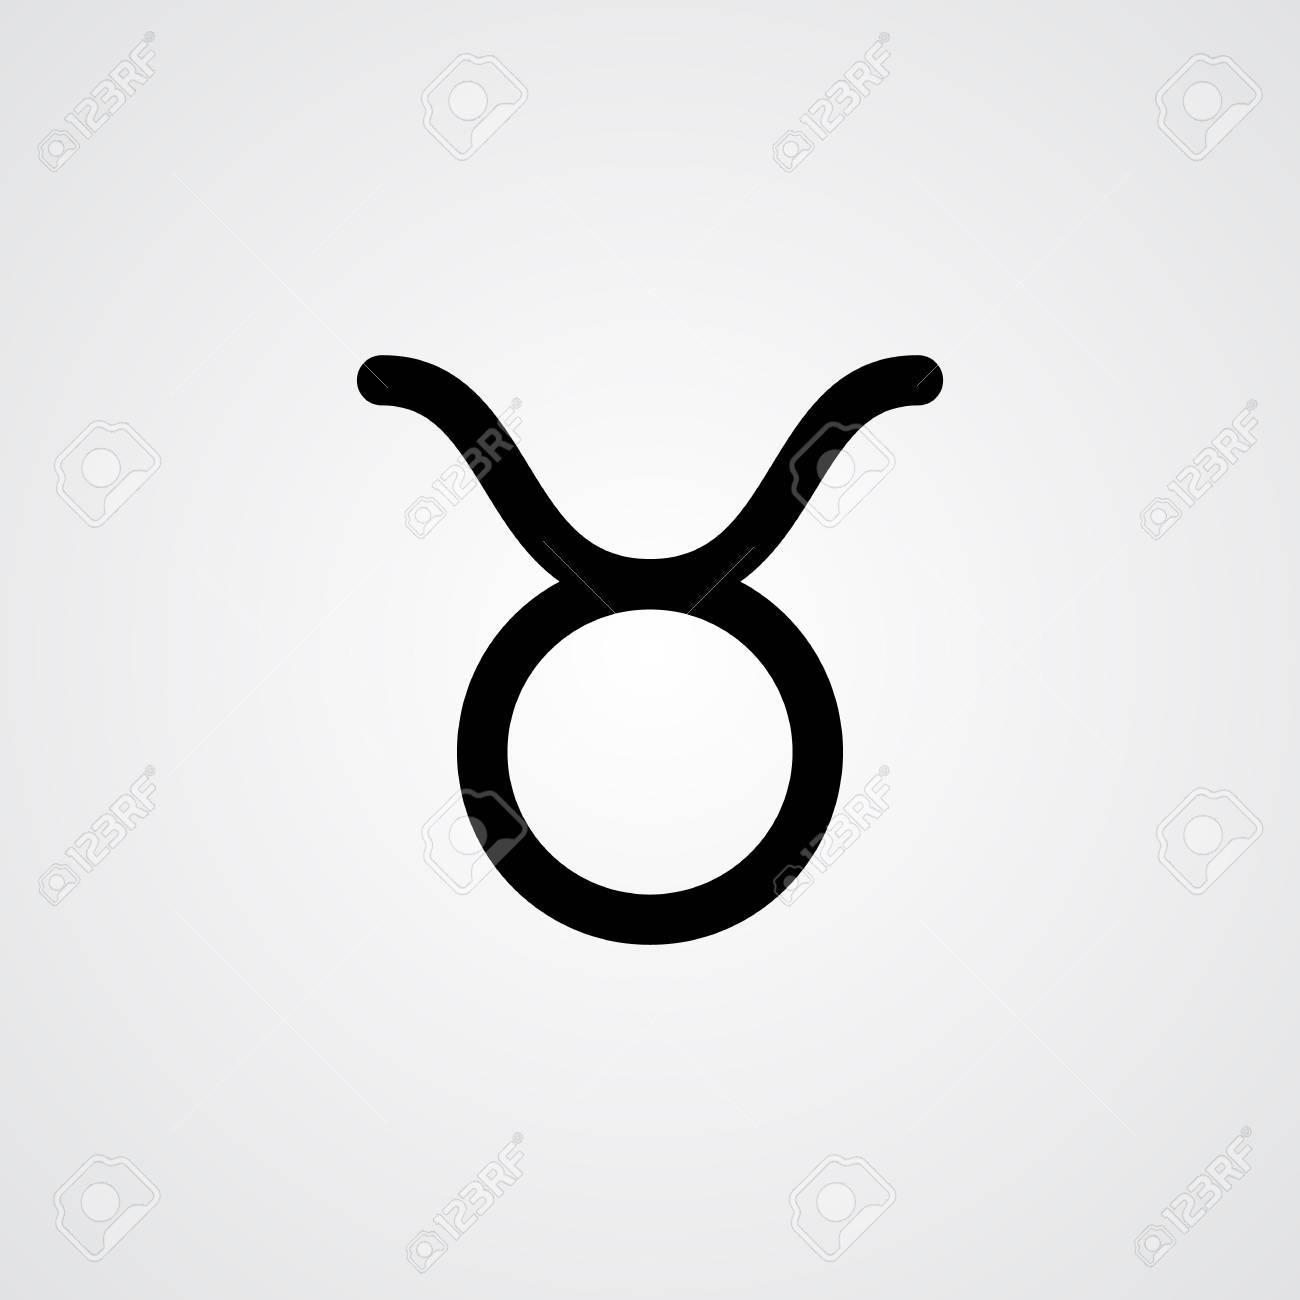 Taurus horoscope symbol.